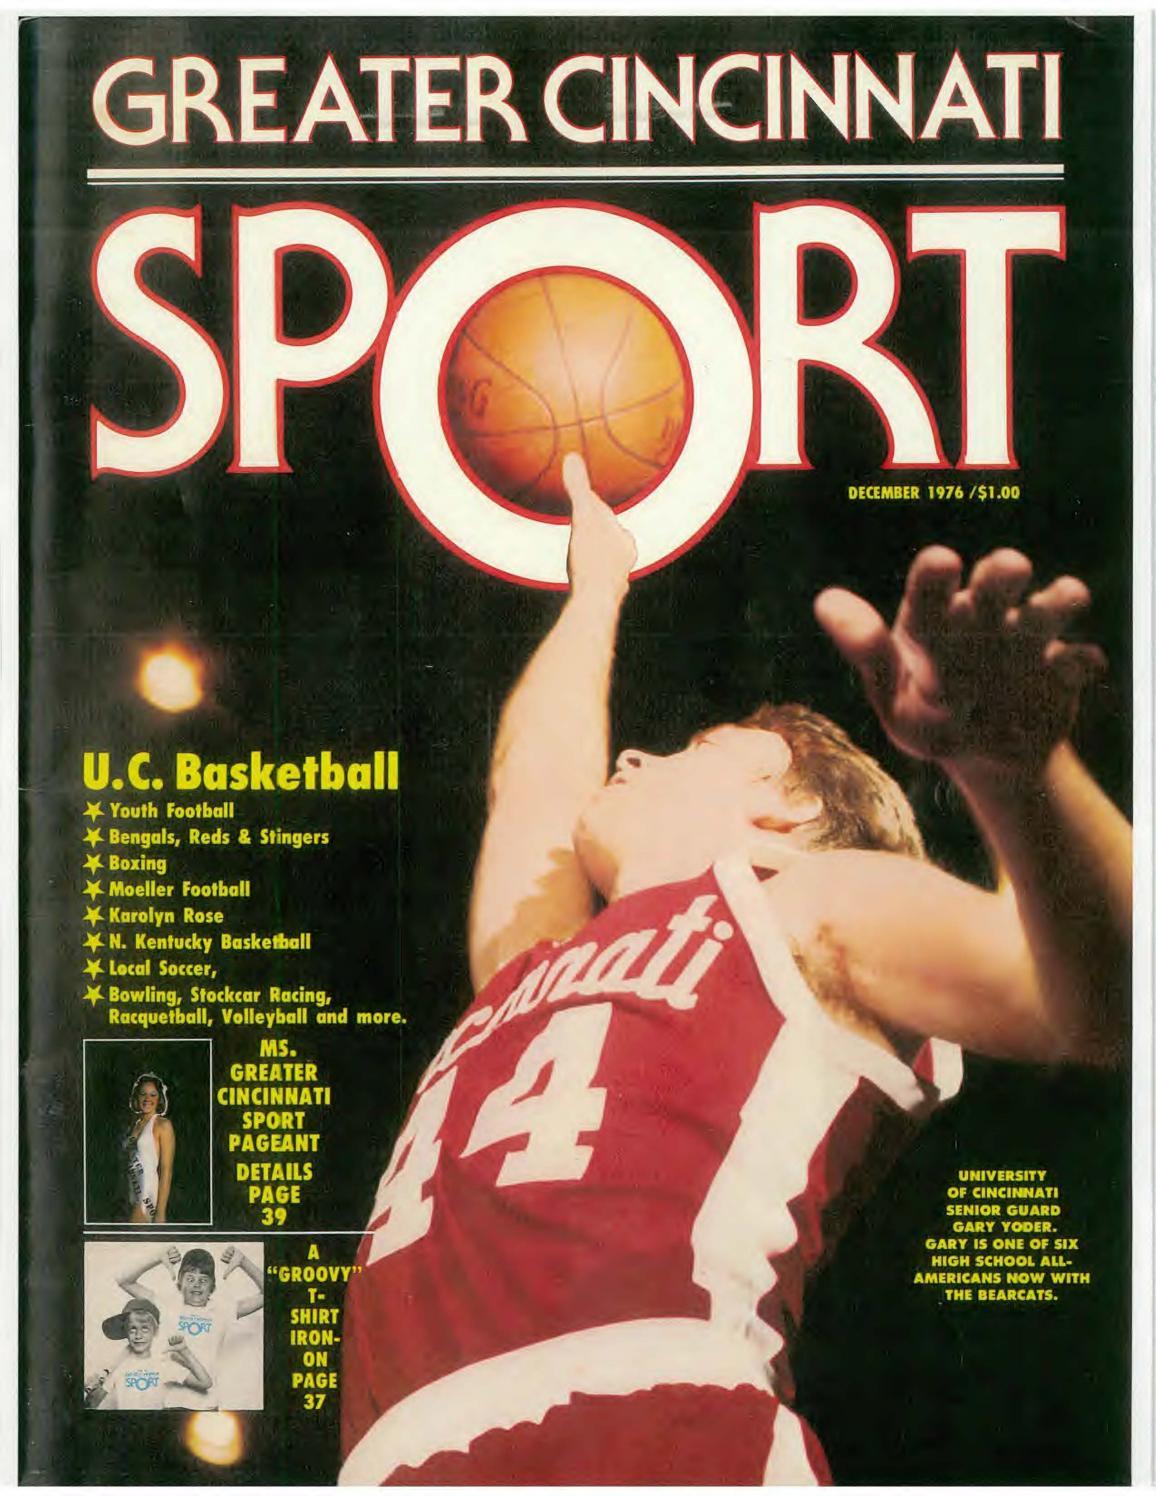 Moeller High School 1976-77 Greater Cincinnati Sports Magazine